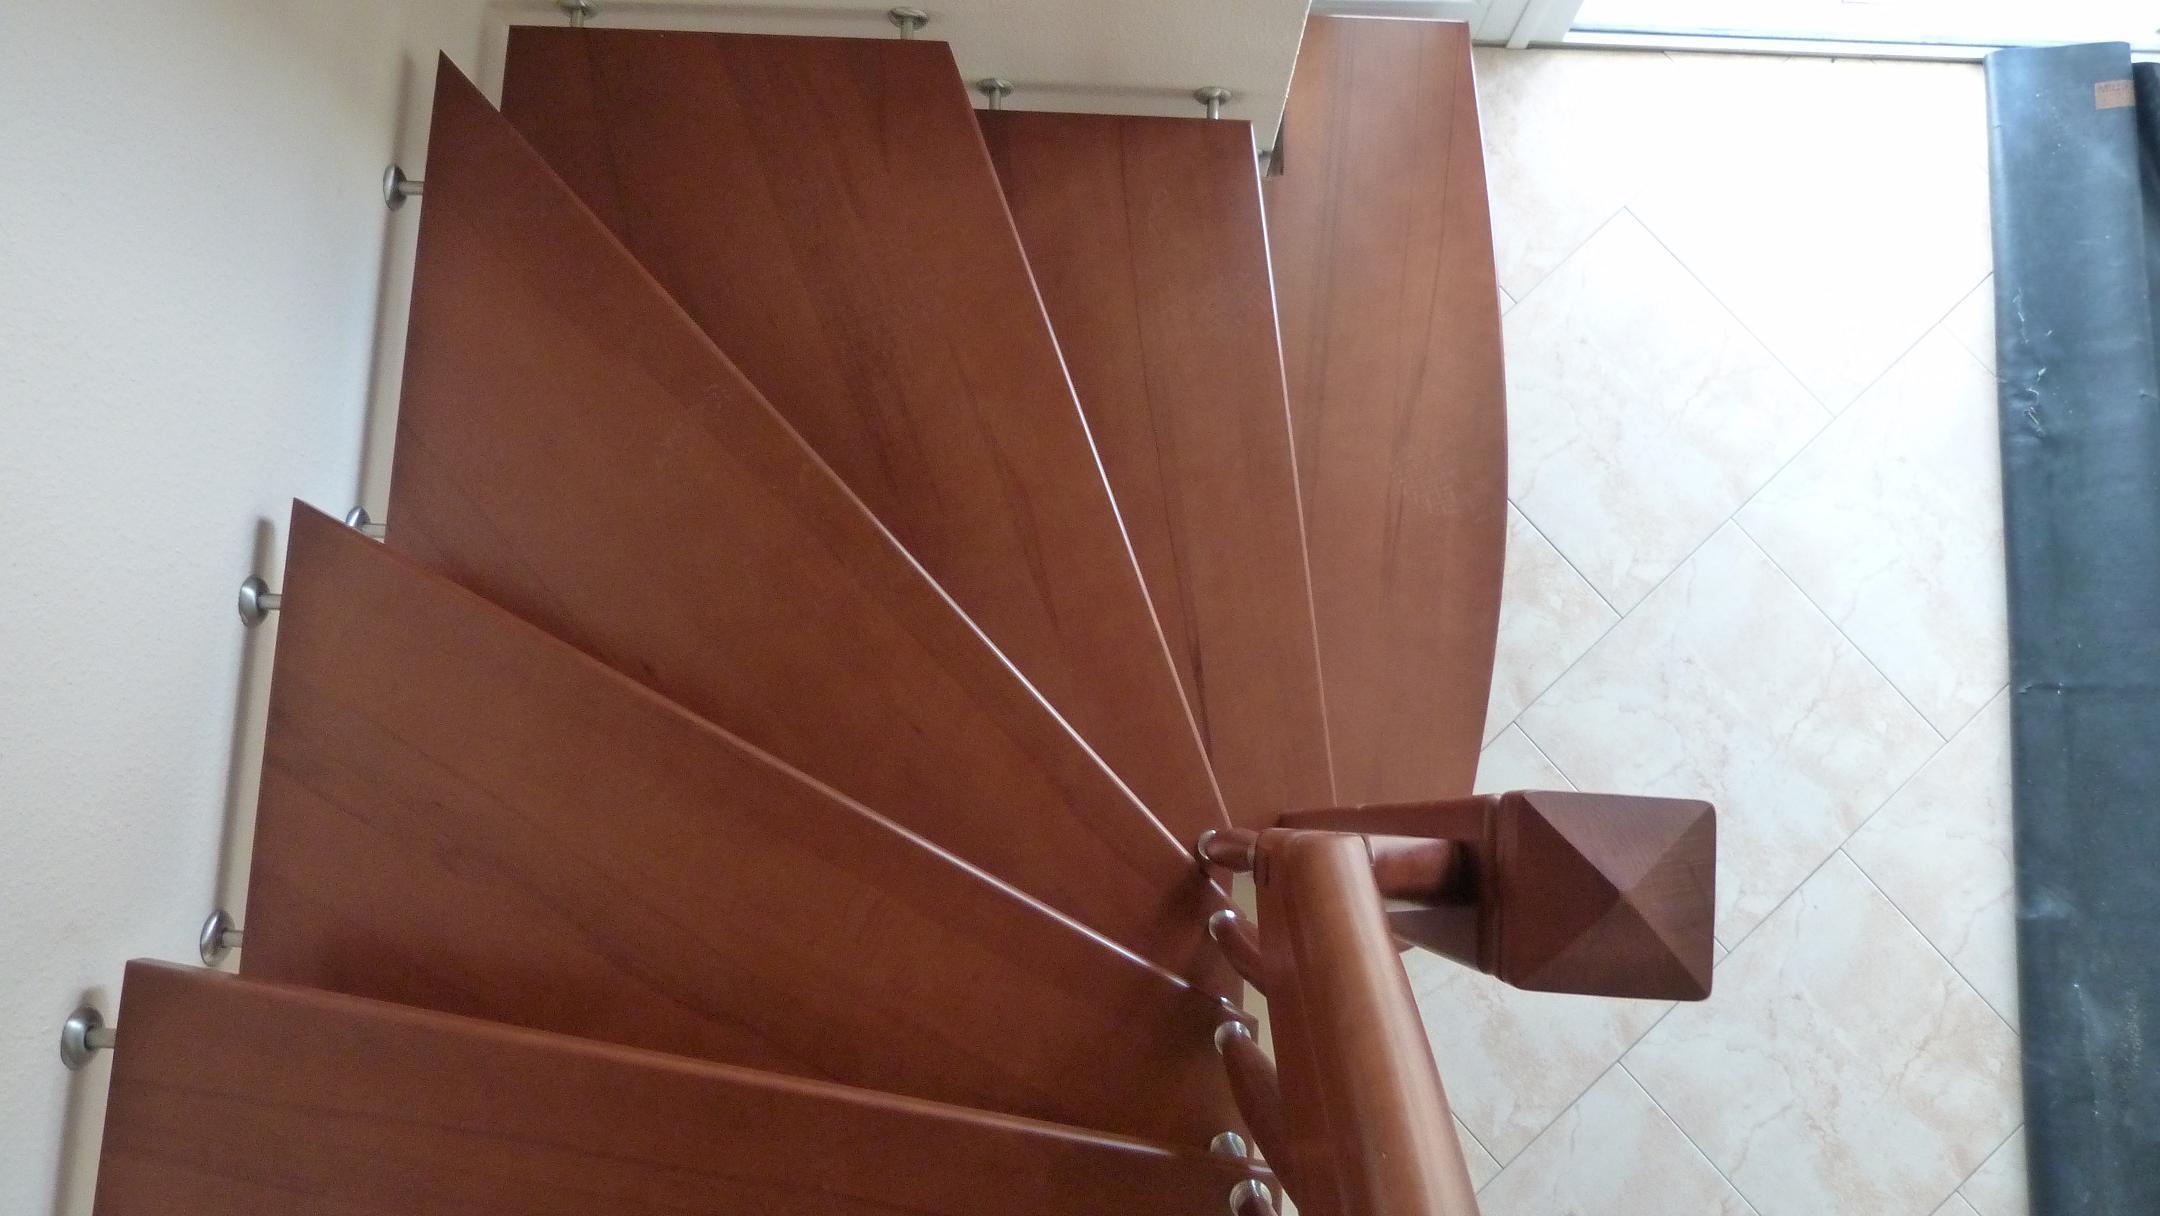 177 Freitragende Treppe Massivholz Kernbucge Farbe dunkel Nussbaum